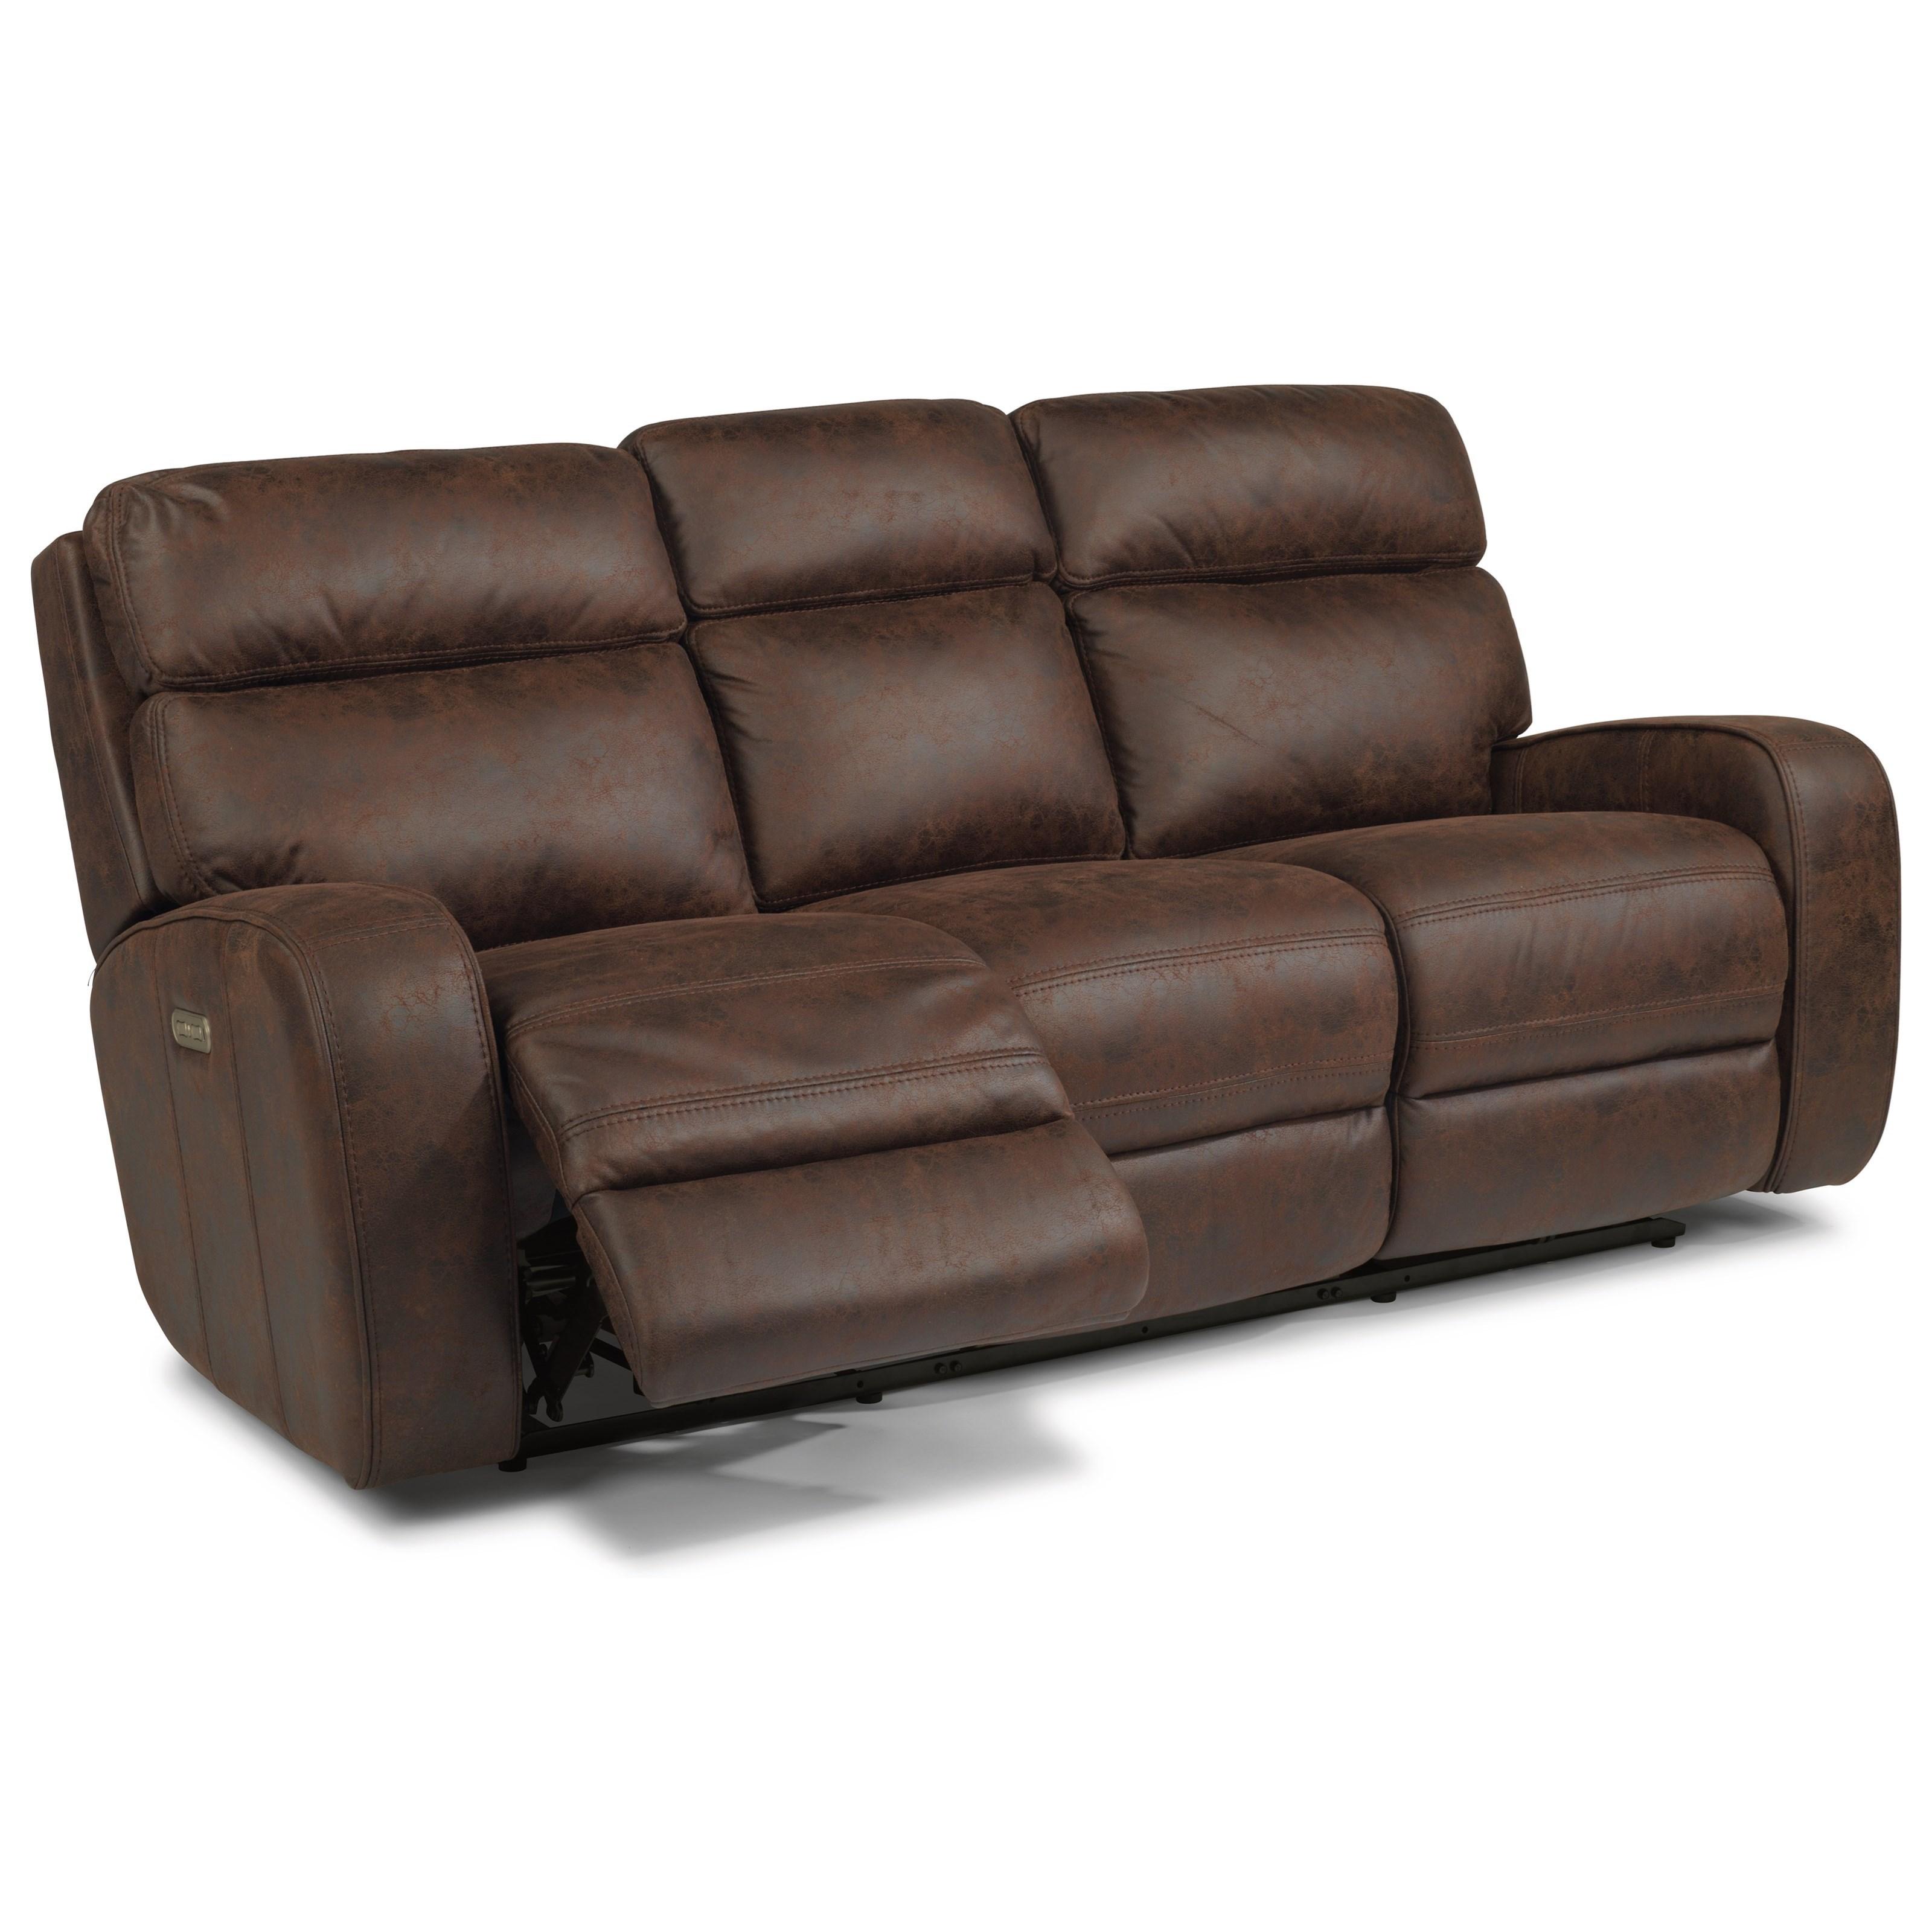 Latitudes - Tomkins Park Reclining Sofa by Flexsteel at Walker's Furniture